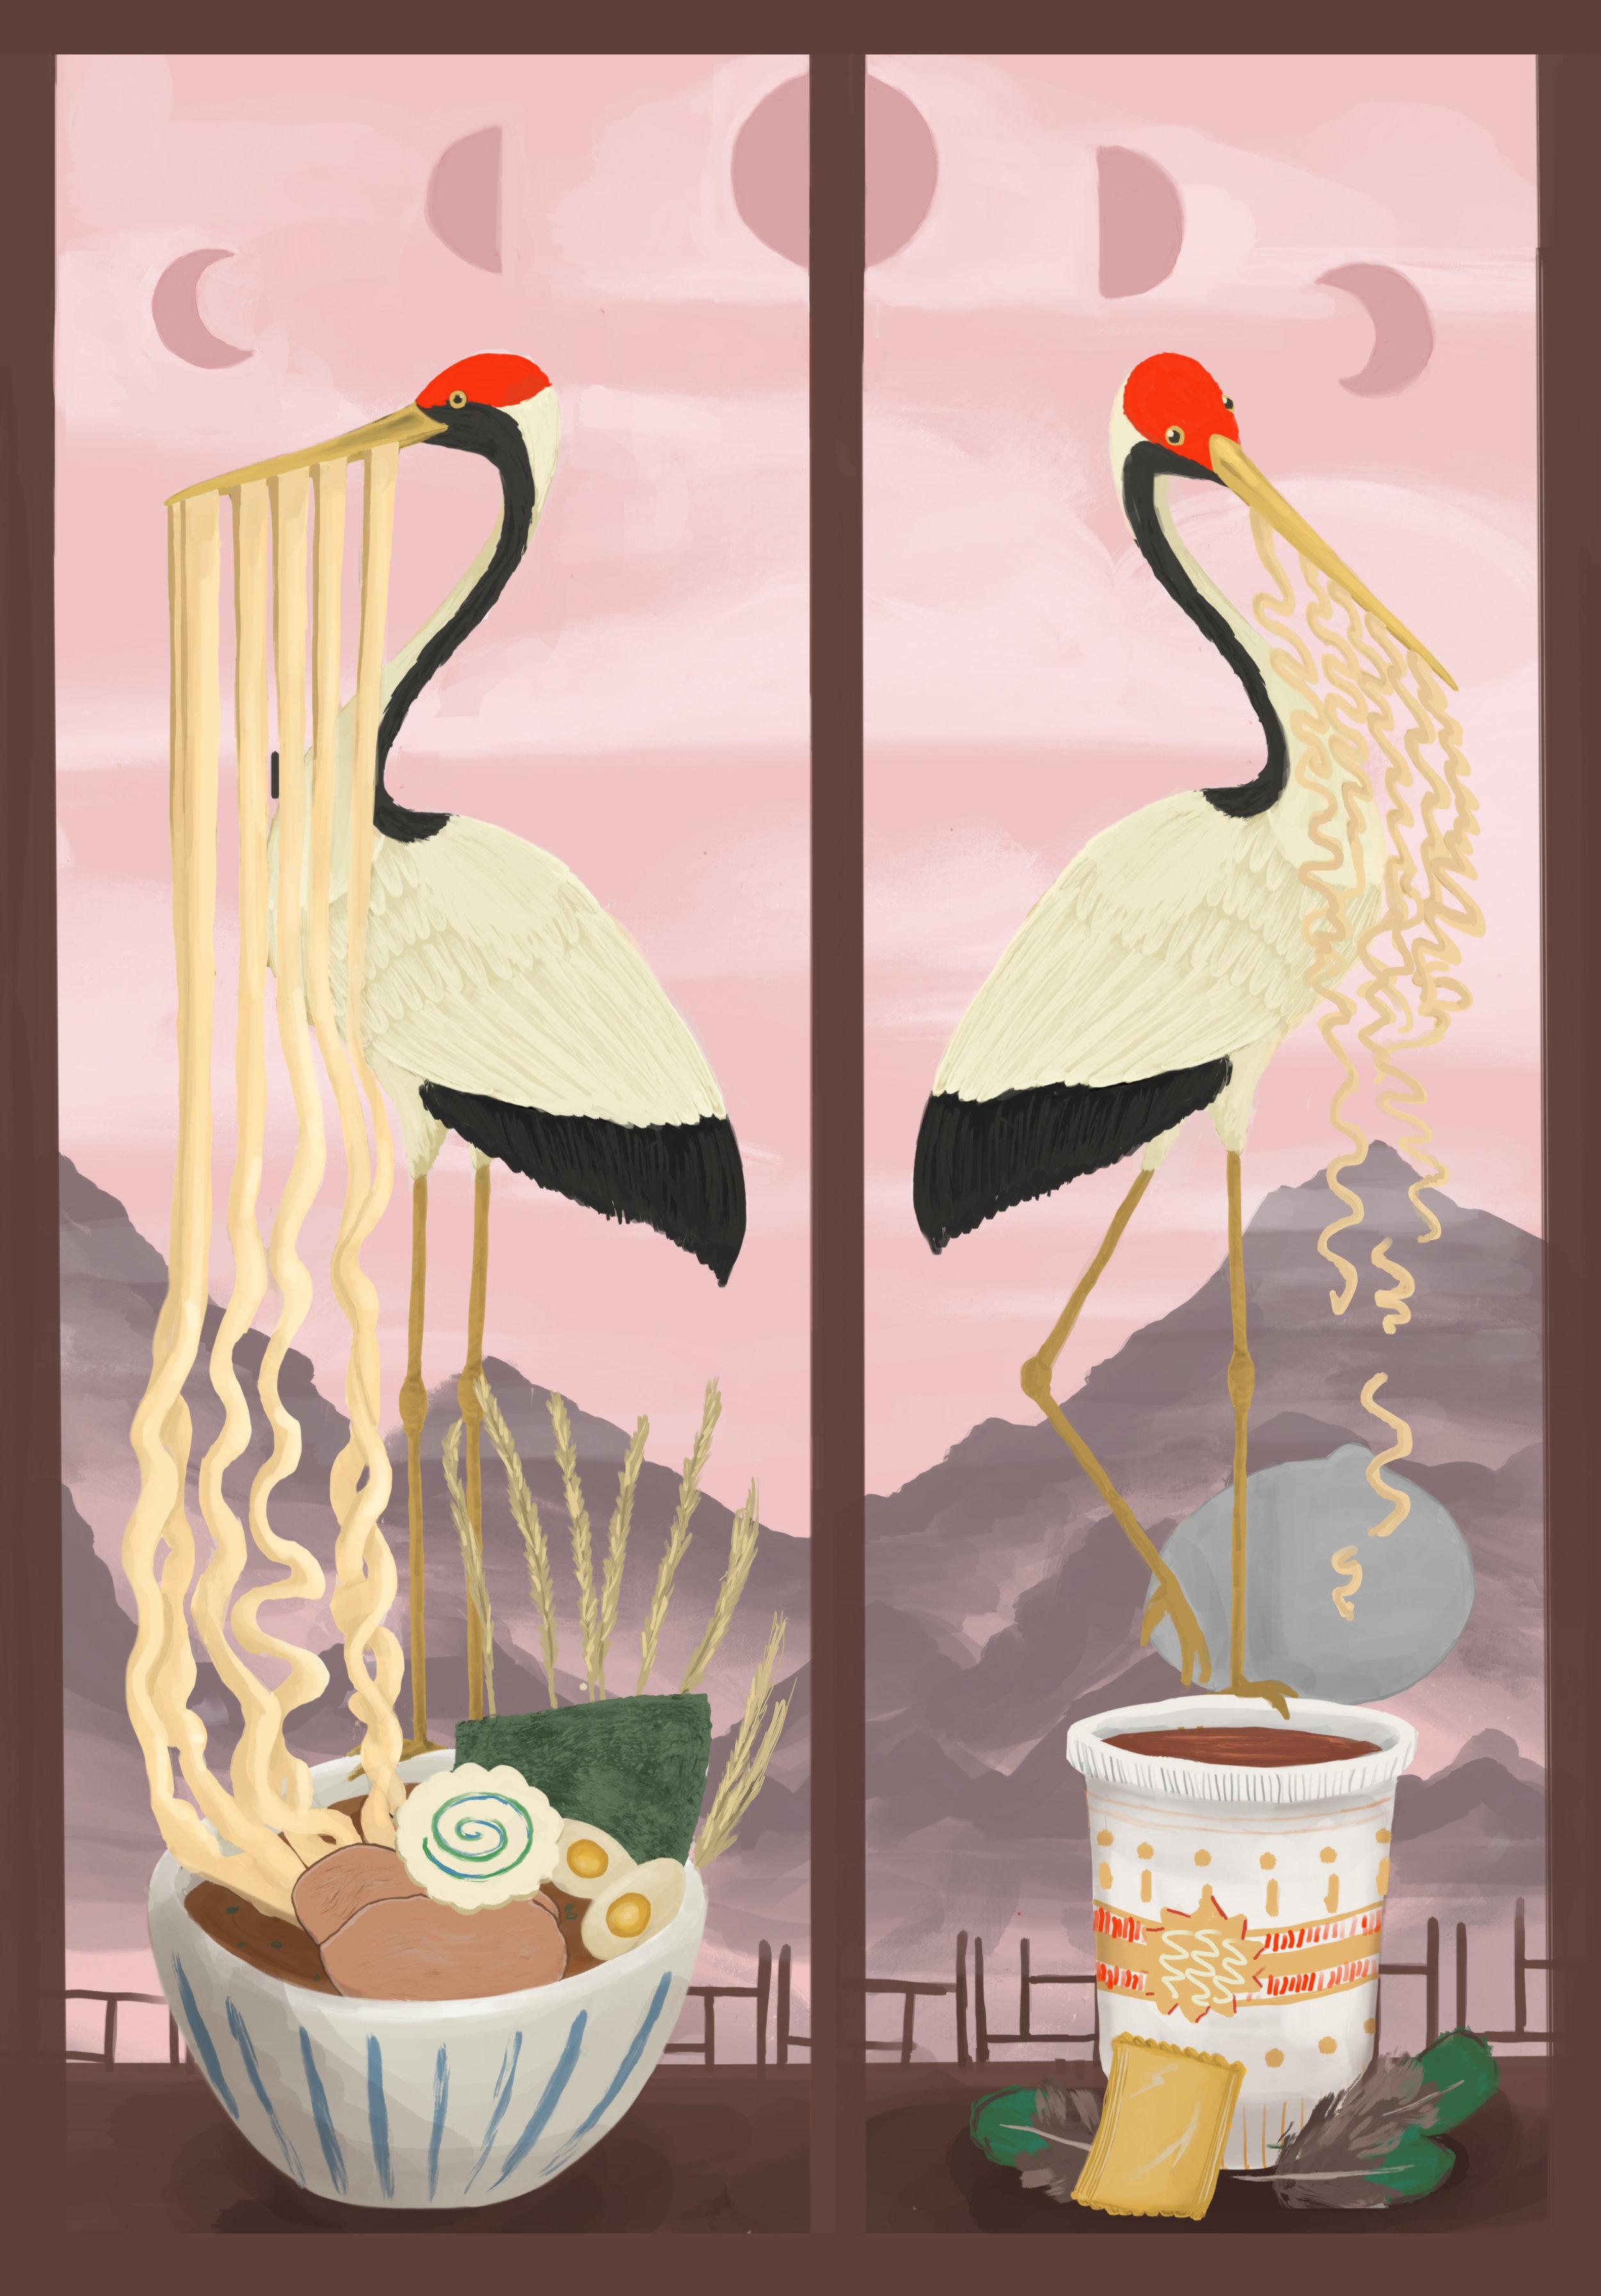 ej-saunders-appreciation-of-all-noodles-but-mostly-ramen.jpg